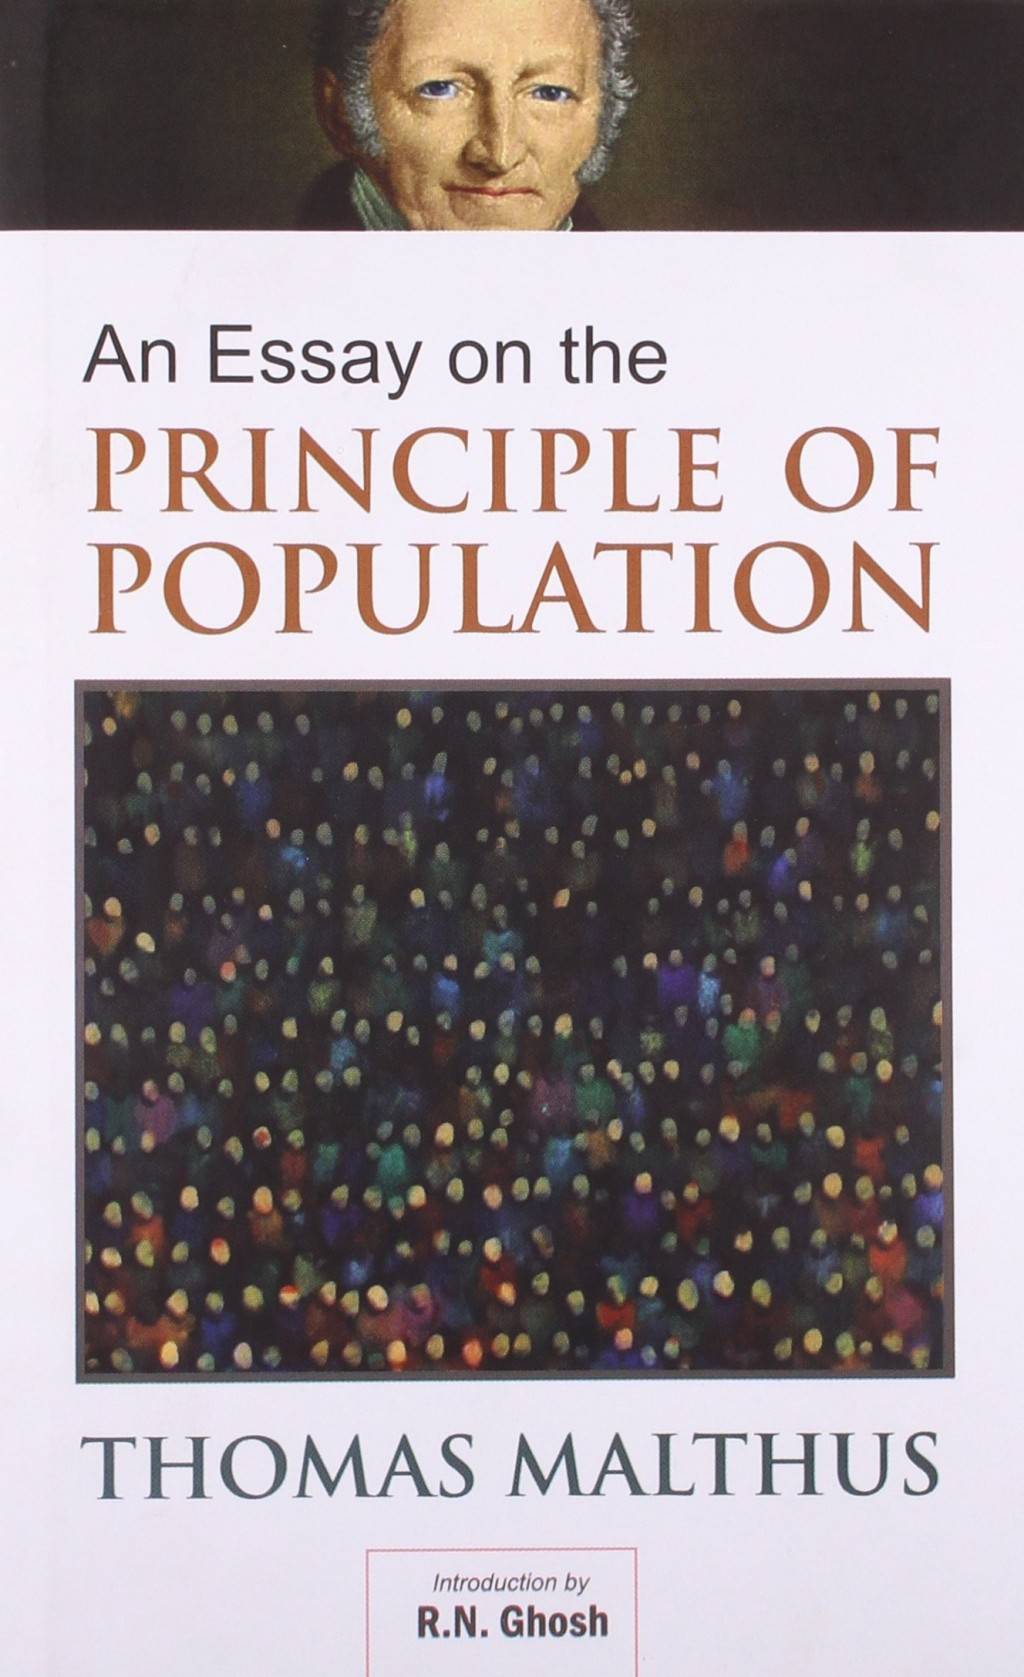 006 Essay On The Principle Of Population 8162bfm1ycfl Singular Pdf By Thomas Malthus Main Idea Large